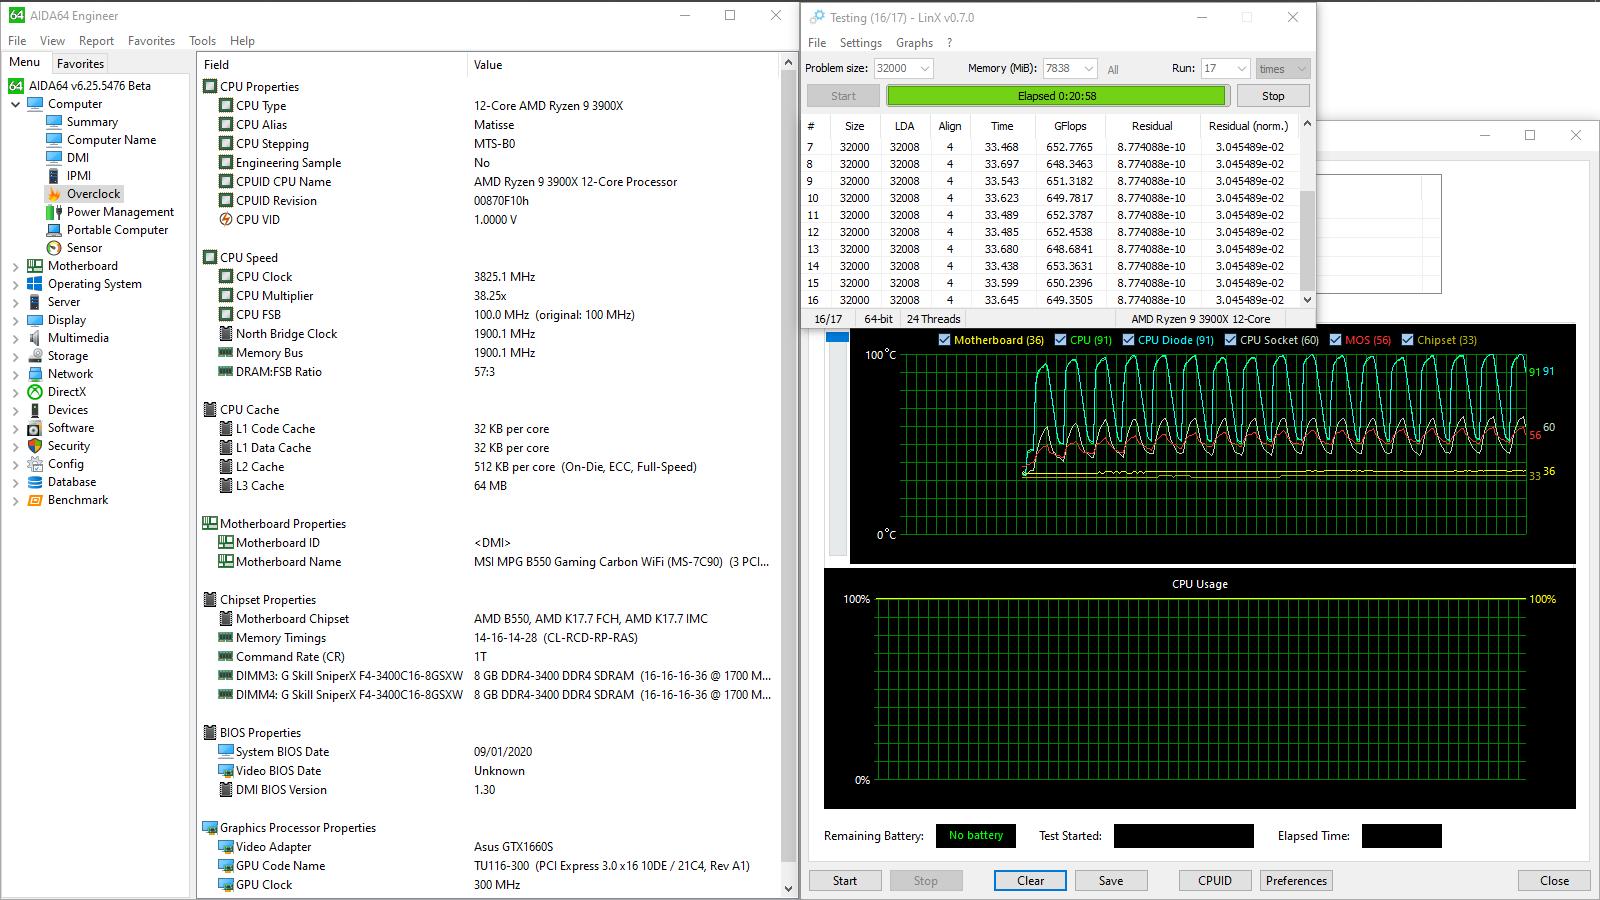 Обзор материнской платы MSI MPG B550 Gaming Carbon WiFi. Парадный мундир